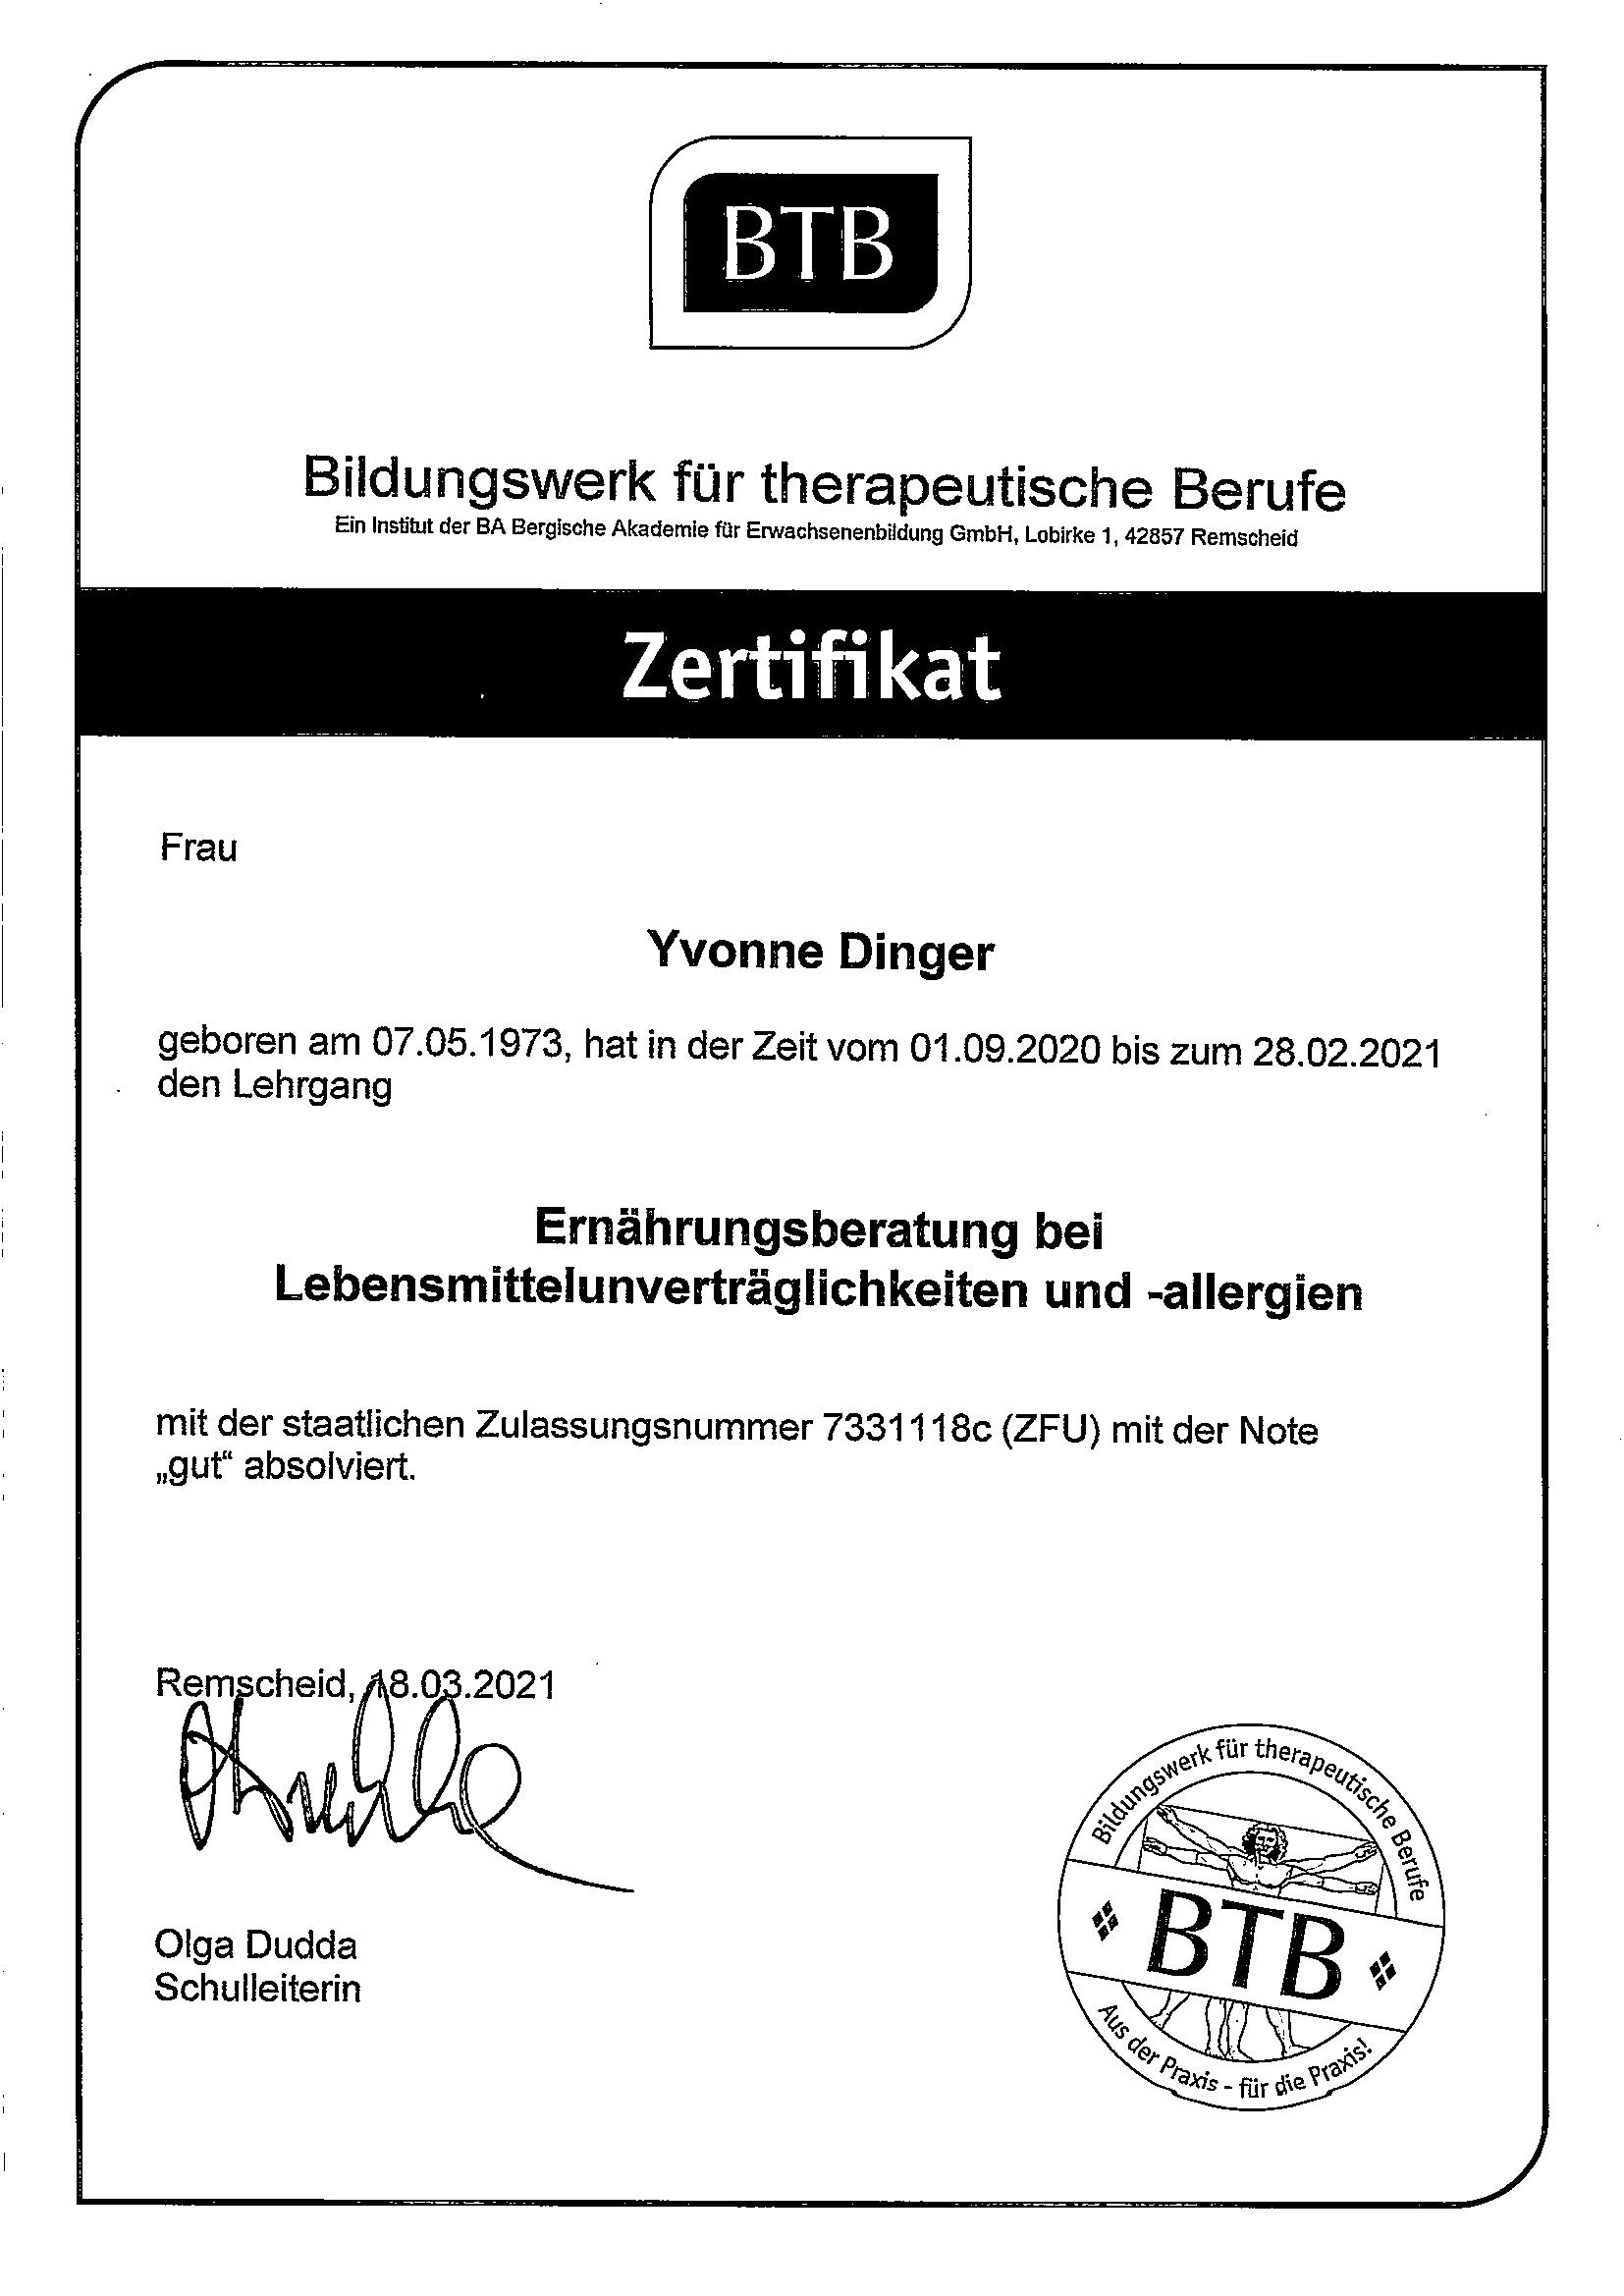 Zertifikat Ernährungsberatung Yvonne Dinger Lebensmittelunverträglichkeit